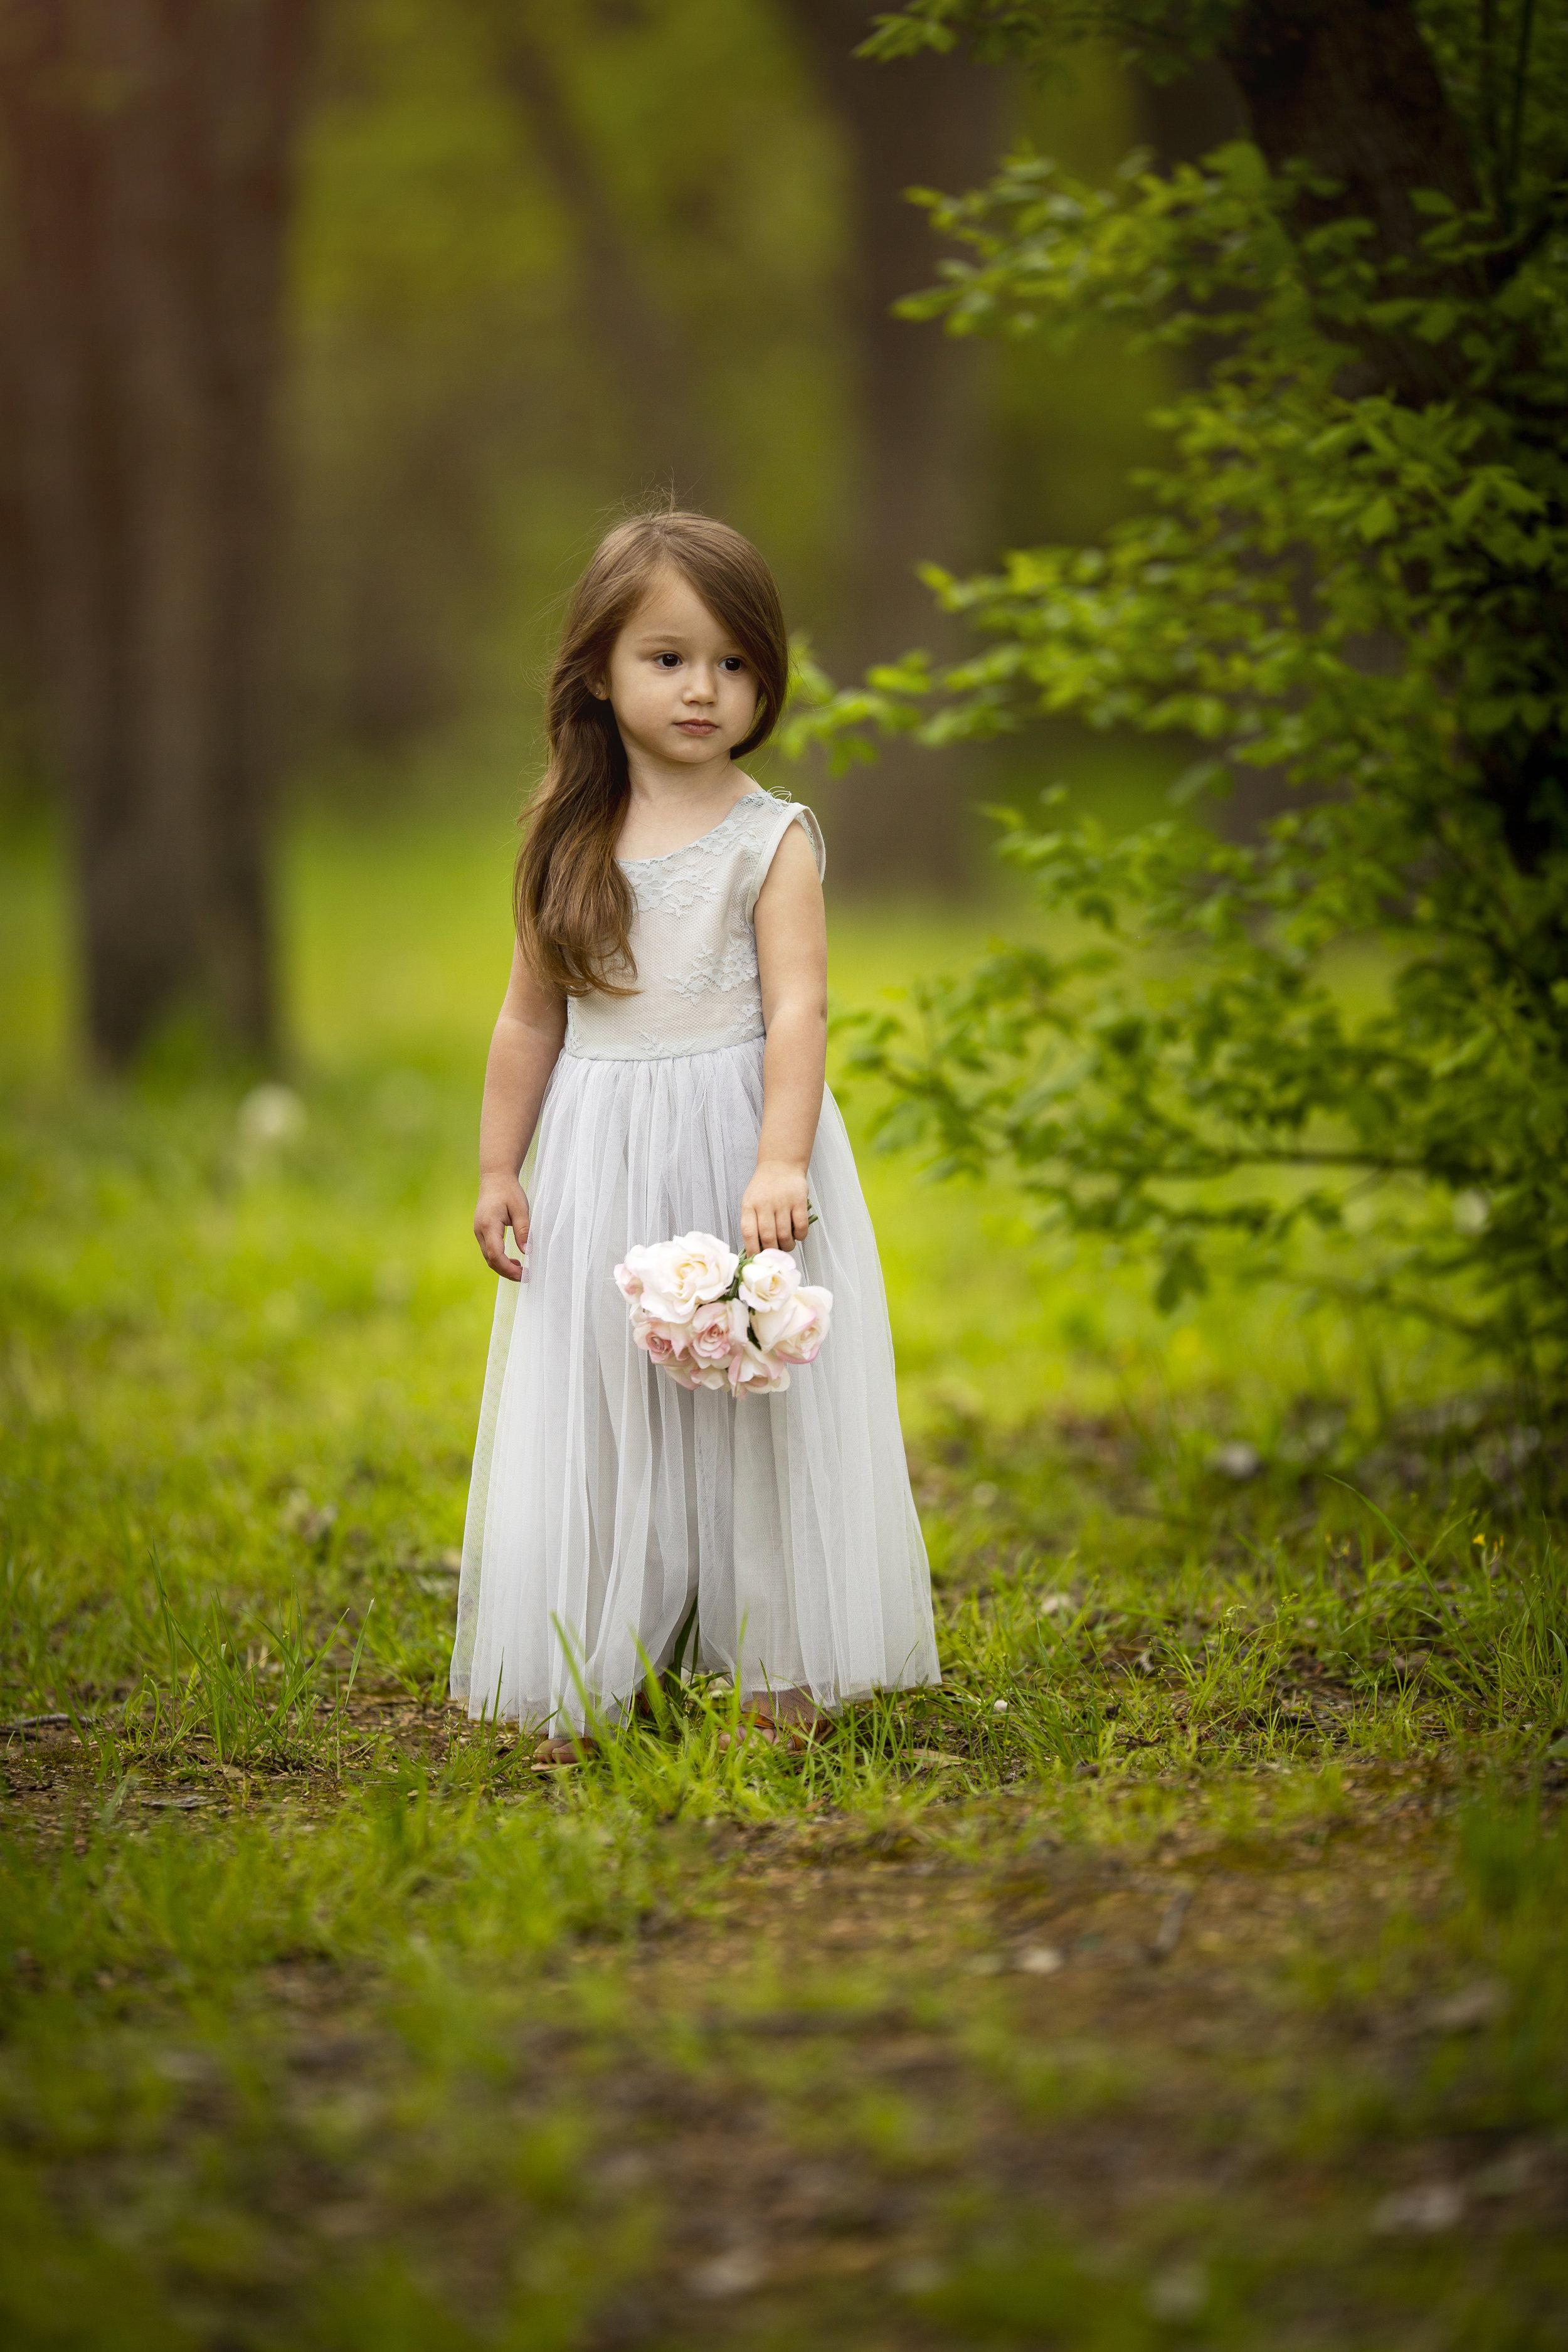 Ana Green Spring and Summer PP mini 04032019  (6).jpg